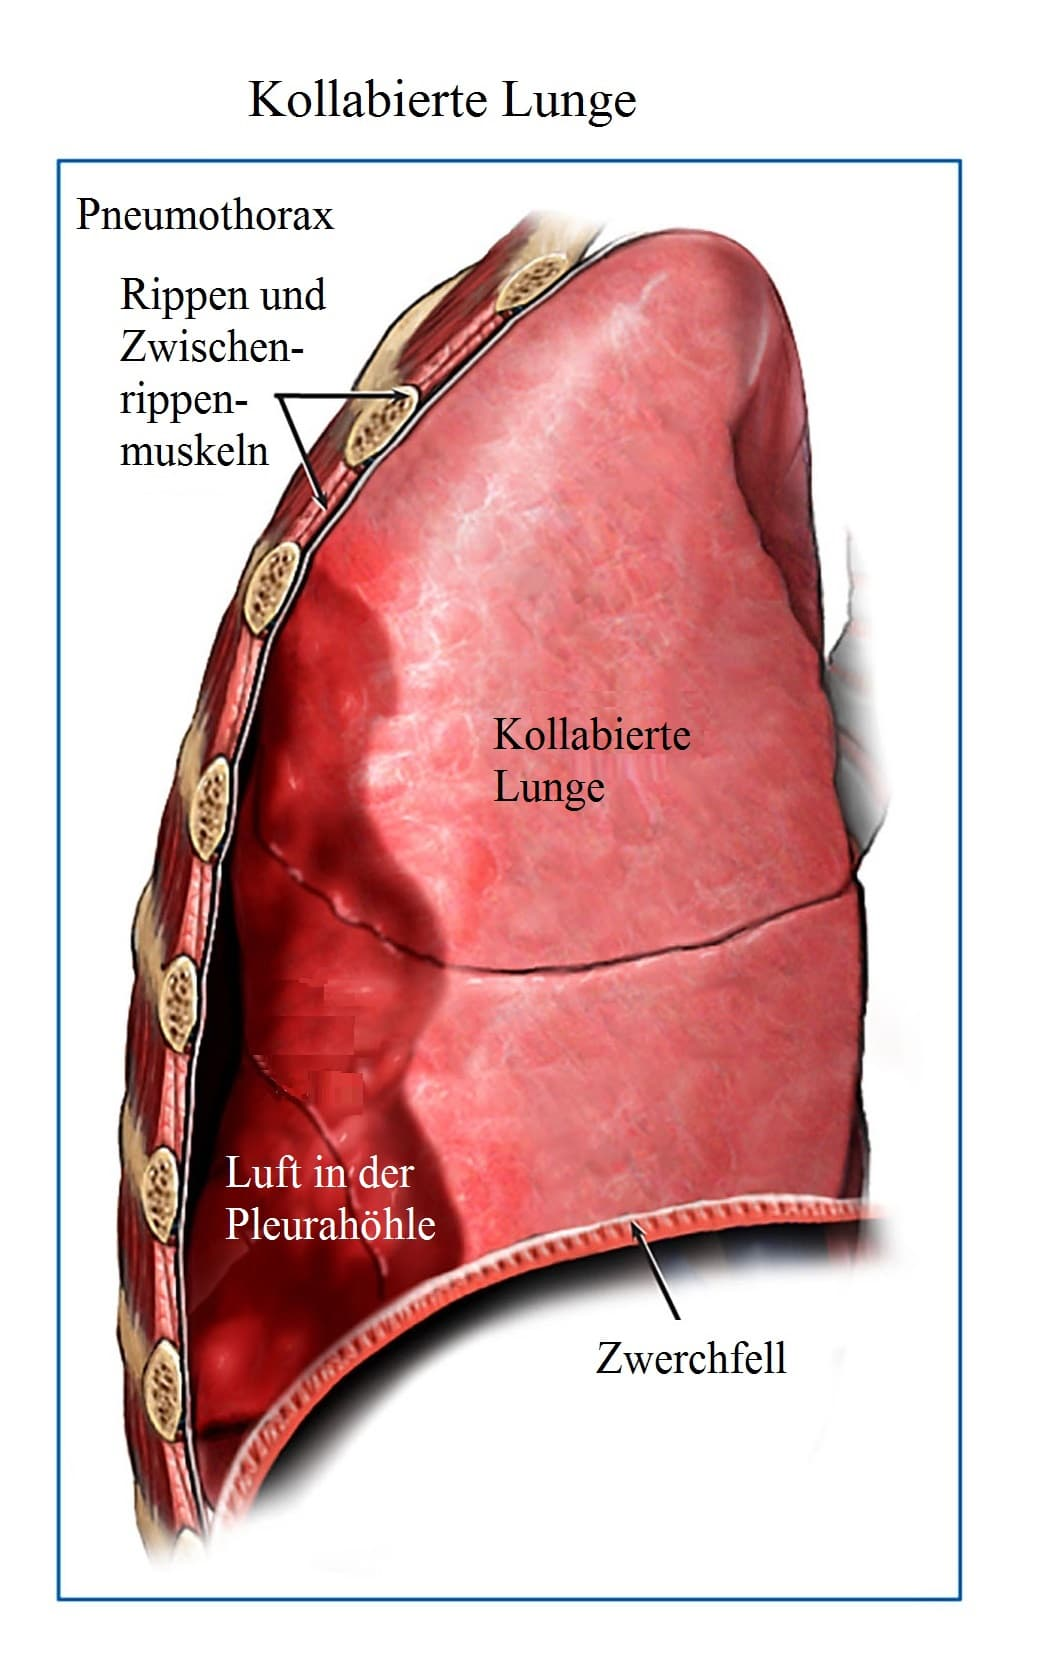 Kollabierte, Lunge, Luft, Pleurahöhle